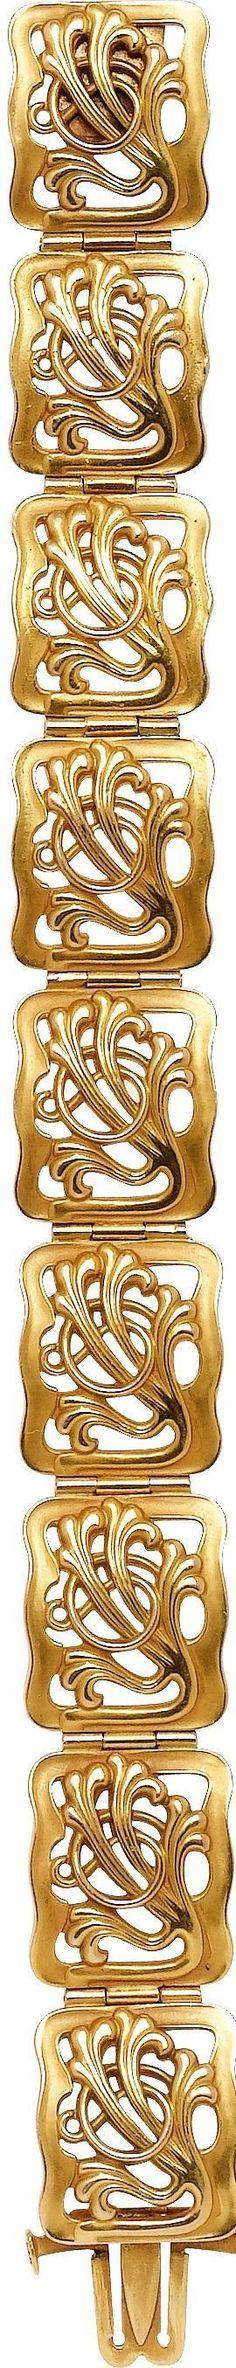 Art Nouveau Gold Bracelet The 14k gold bracelet weighs 29.19 grams. #GoldJewelleryArtNouveau